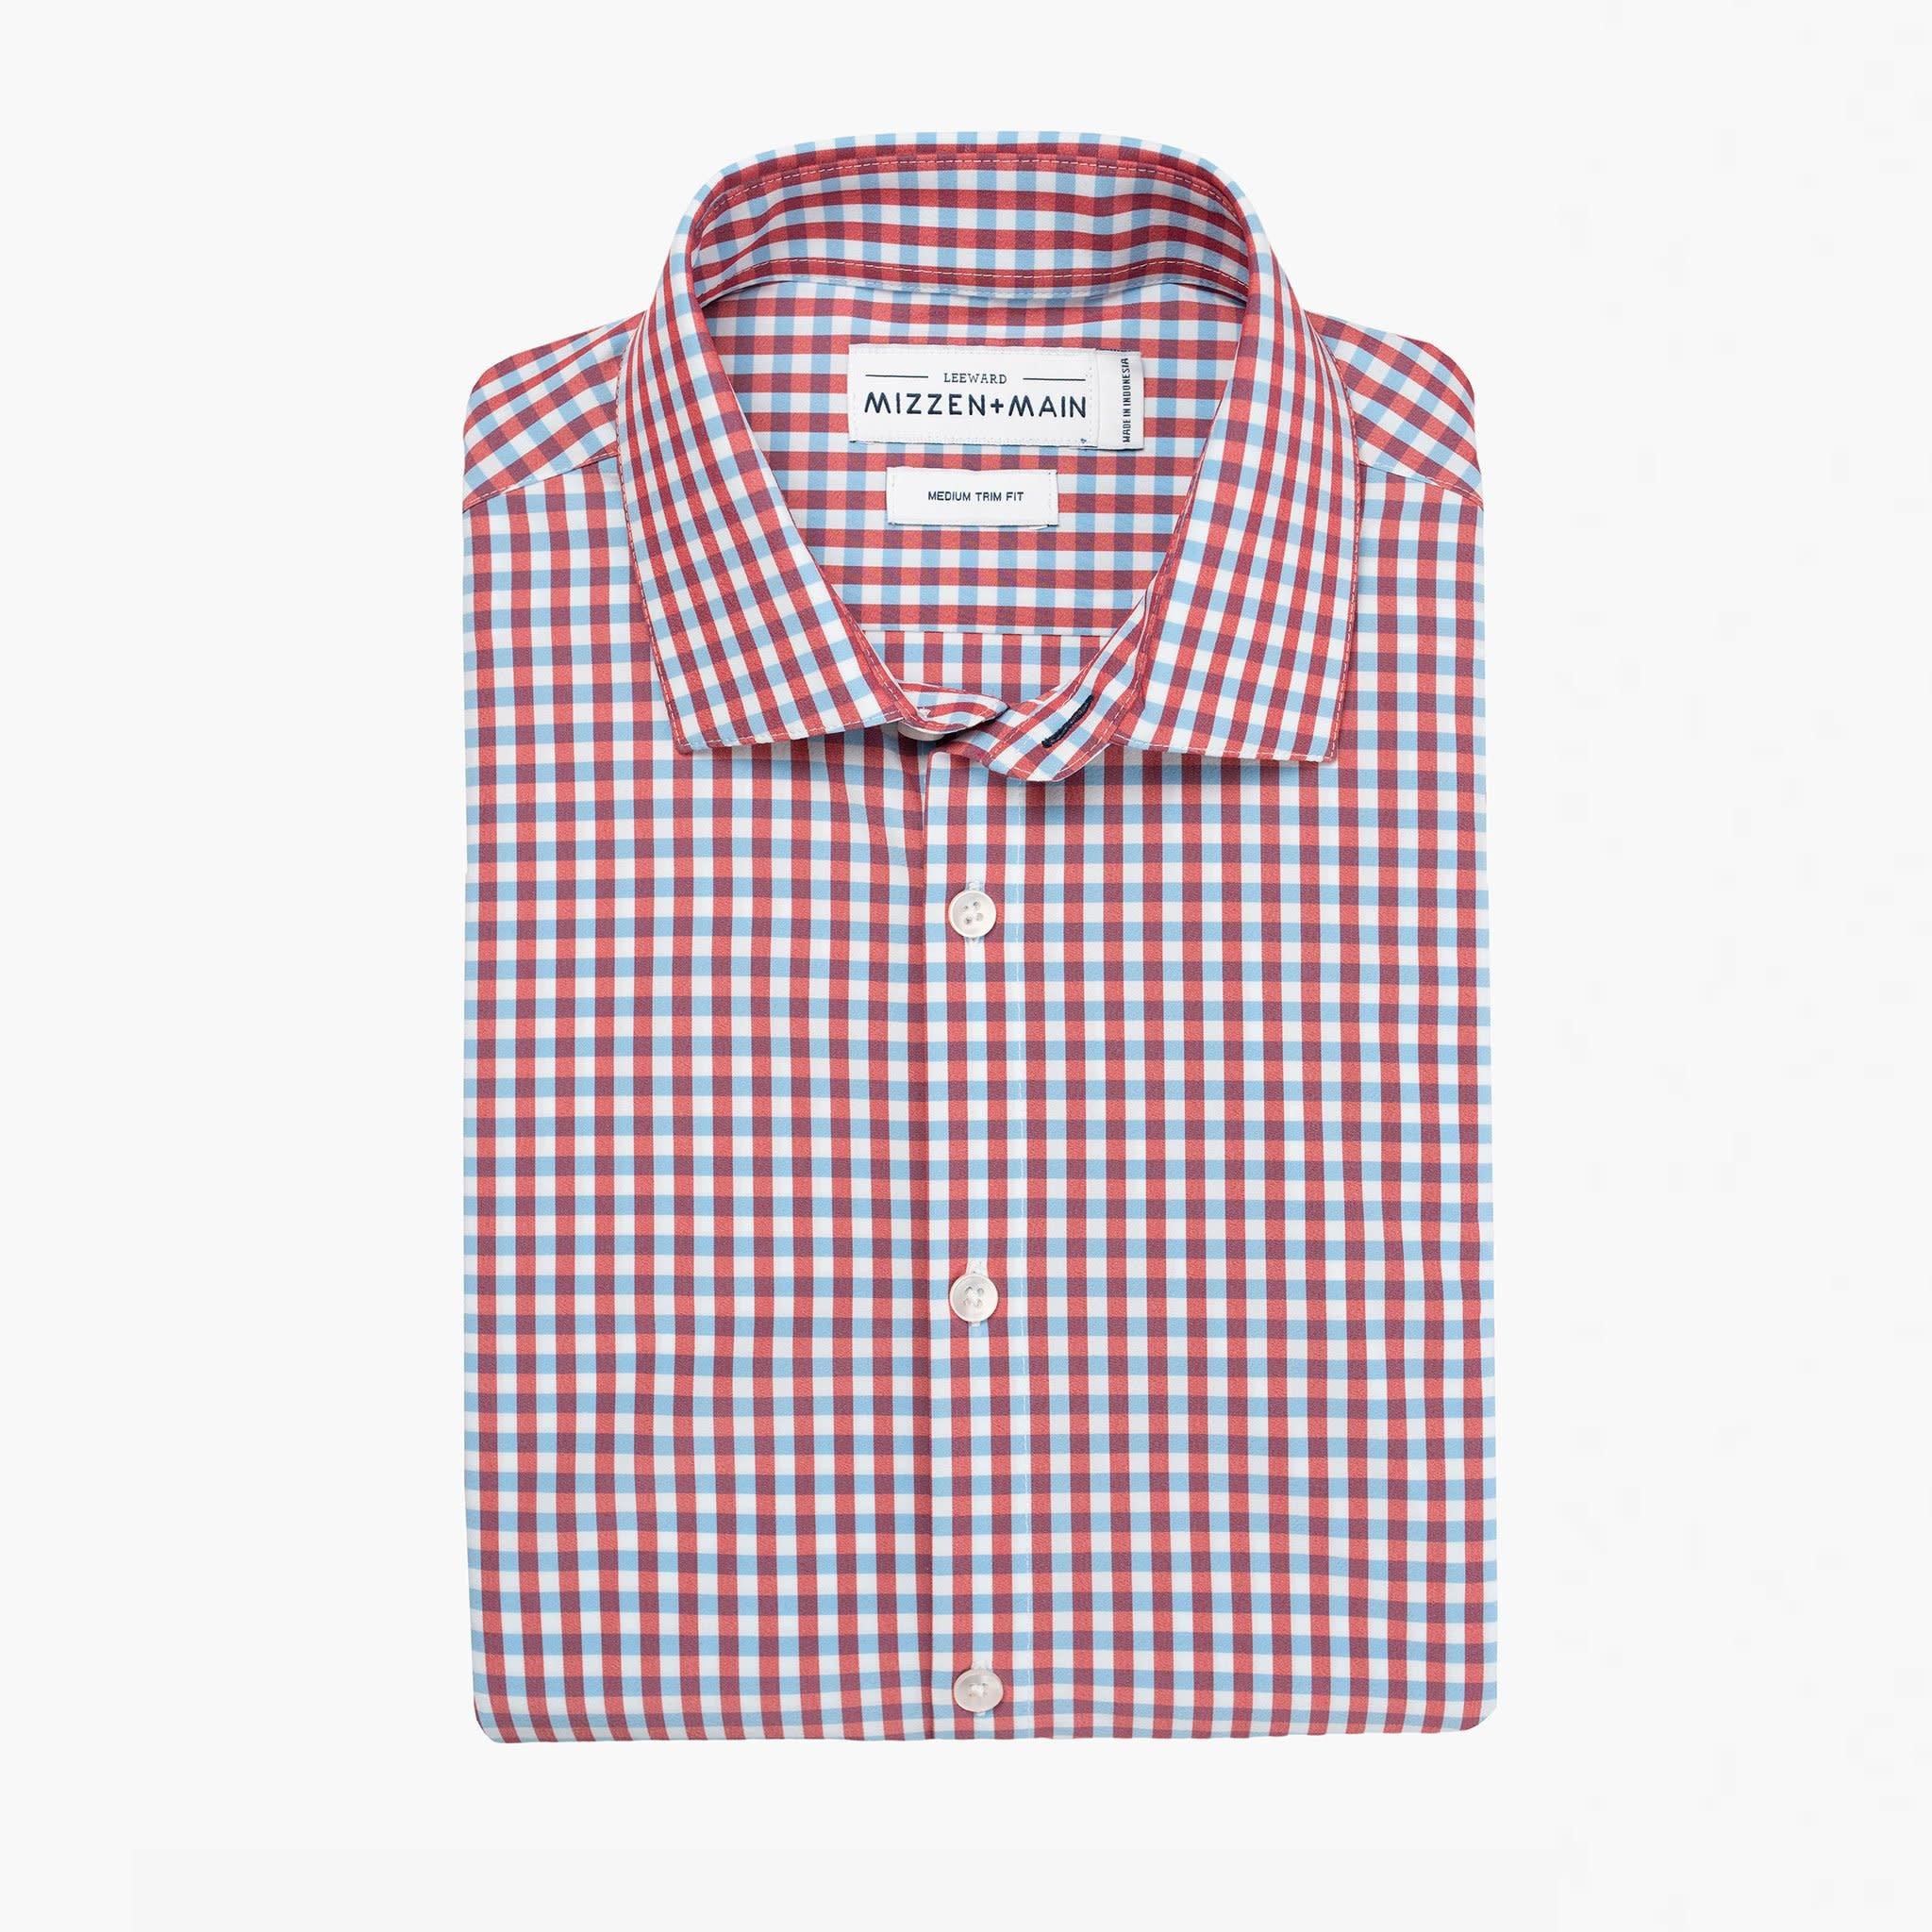 Mizzen+Main MM - Performance Dress Shirt Bishop